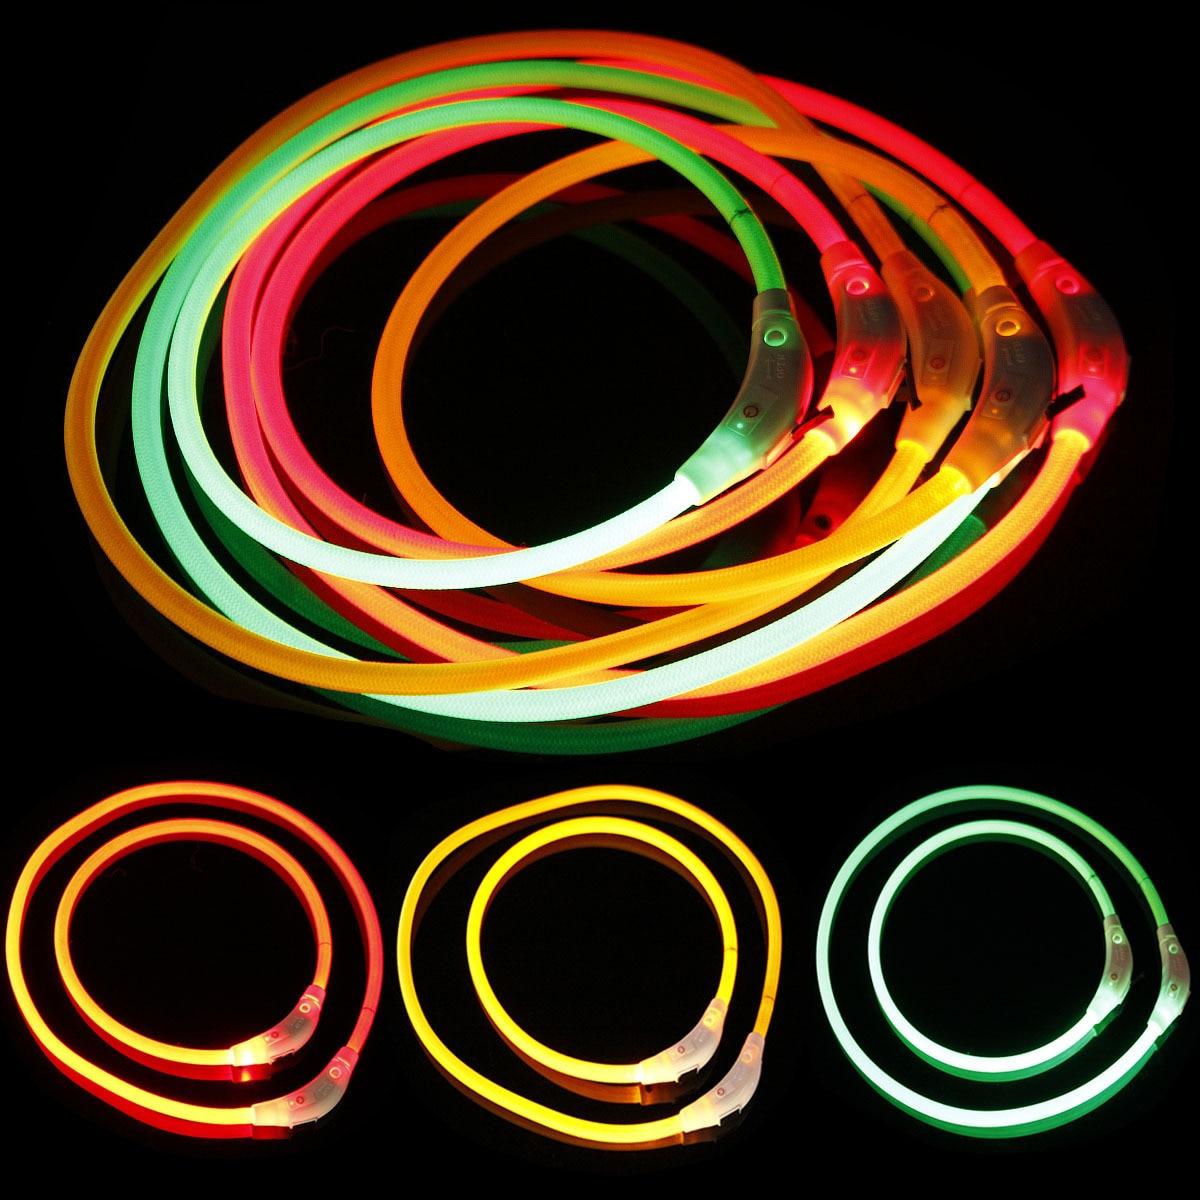 Weaving LED Shining Pet Dog Collar Bite-proof Protector Length 50cm 70cm Hot Sales Dog Luminous Collar